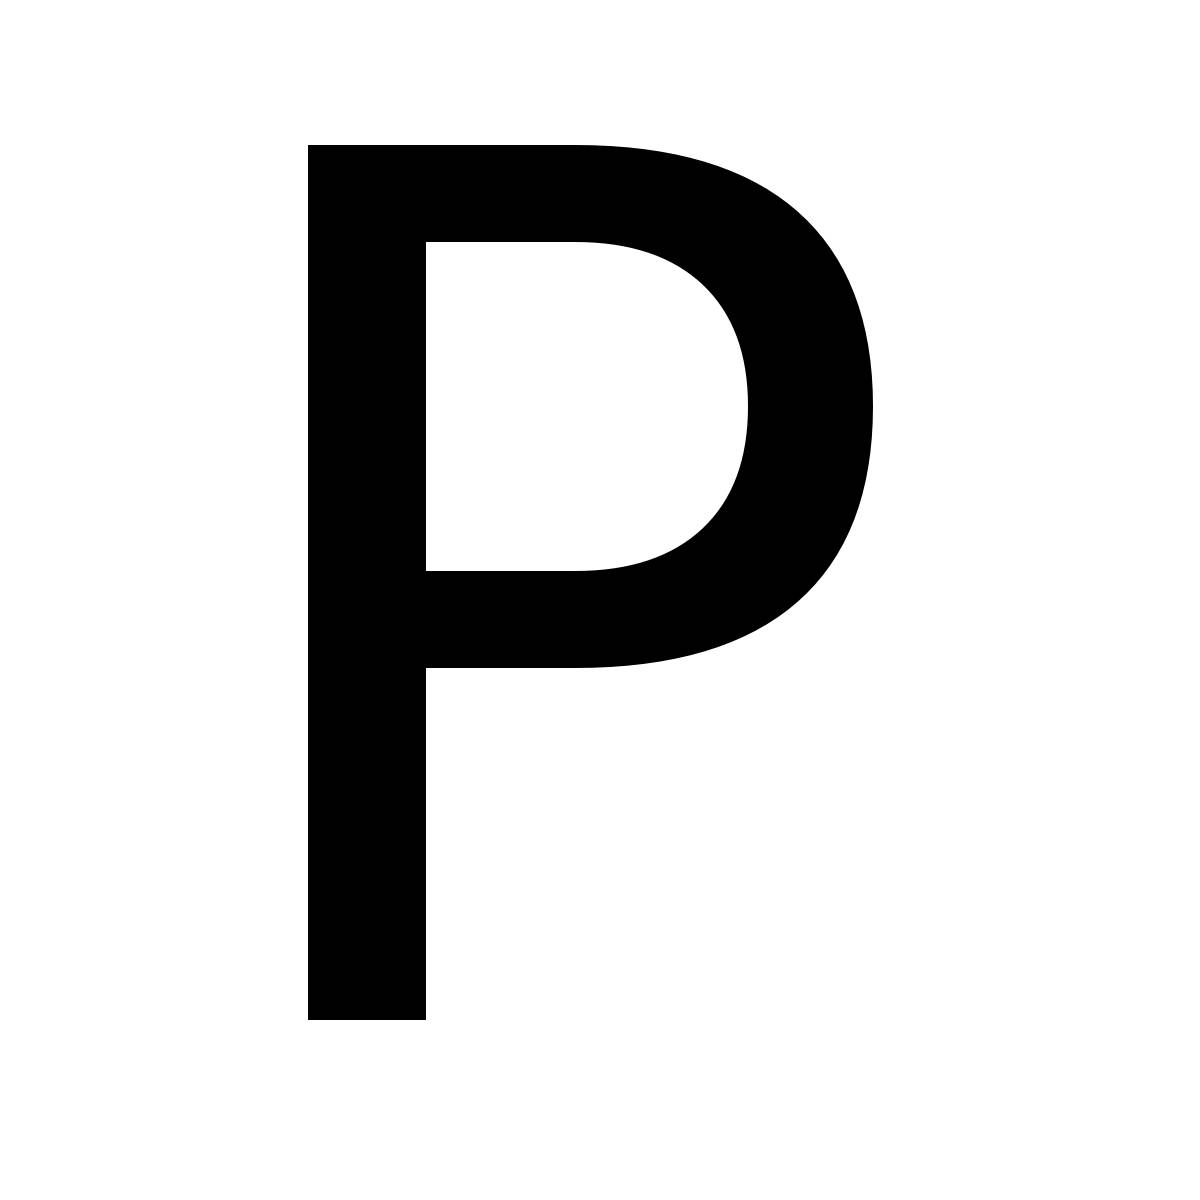 P&l Template Retail